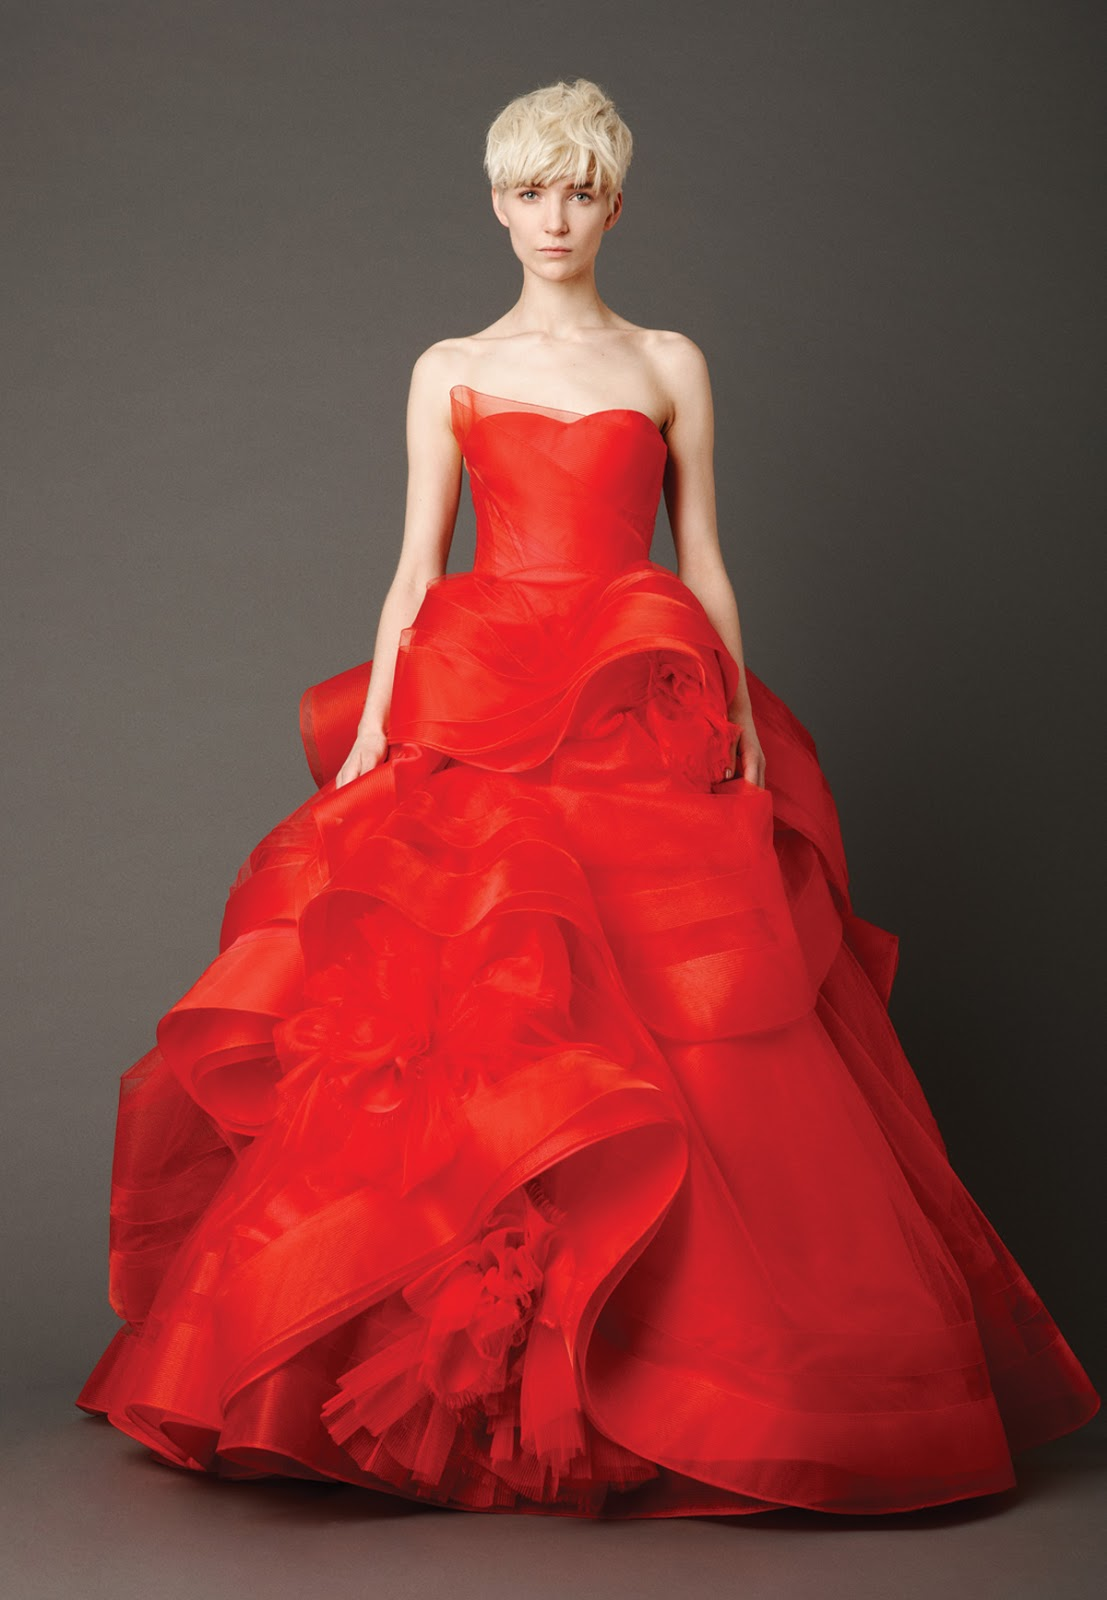 Red Wedding Dresses Trends 2014